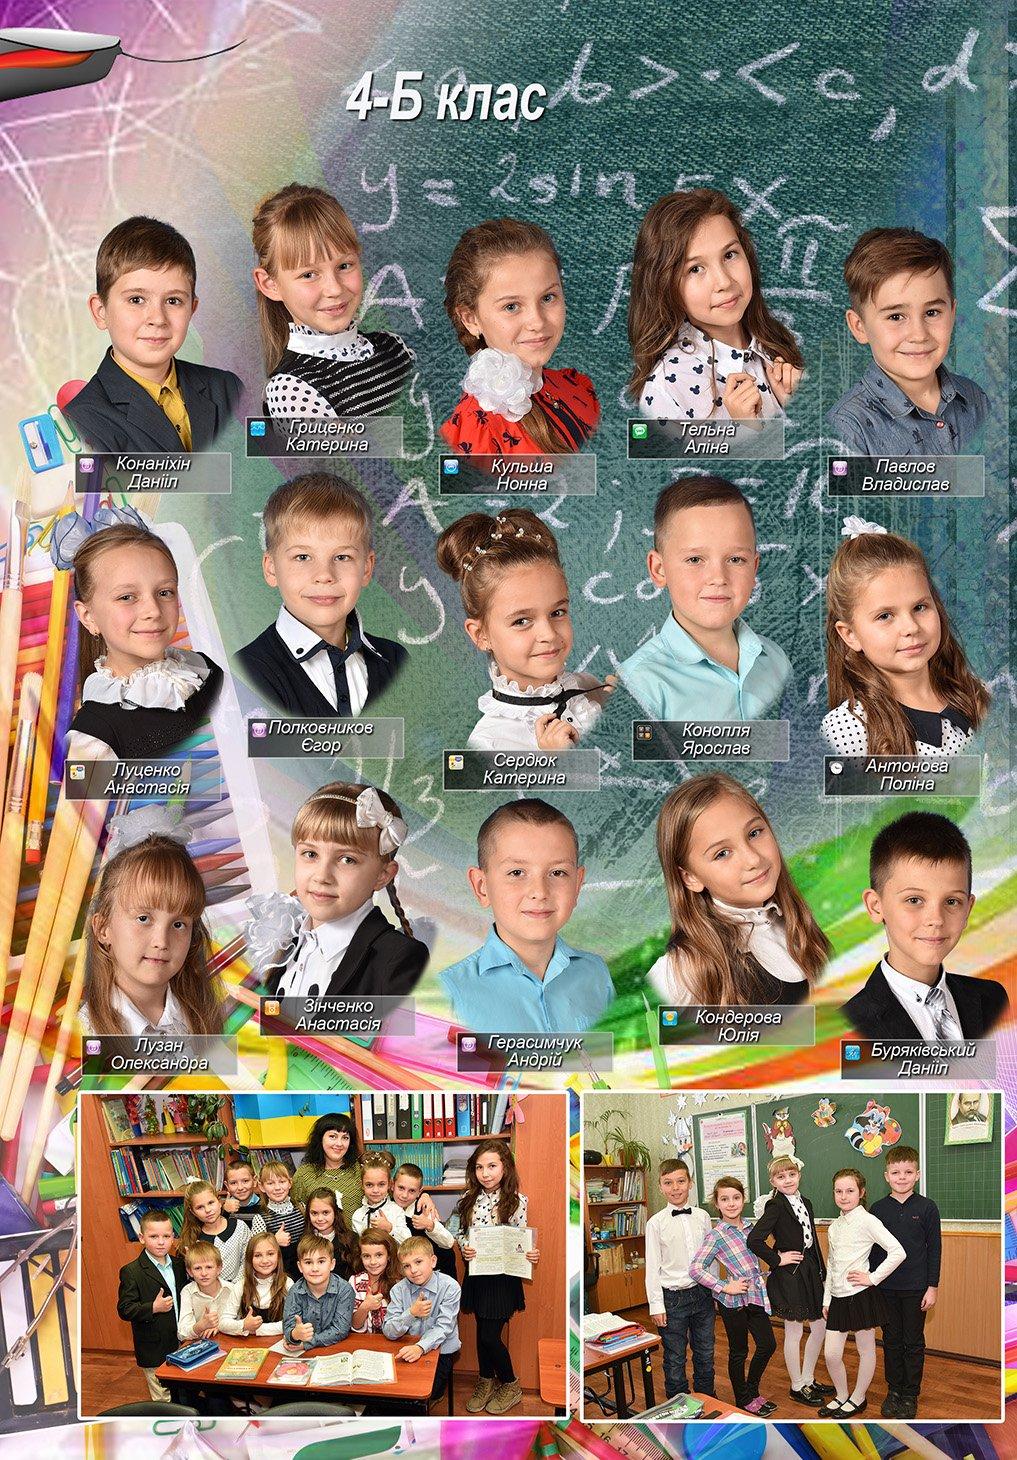 https://school-photo.com.ua/wp-content/uploads/2017/07/02-15.jpg